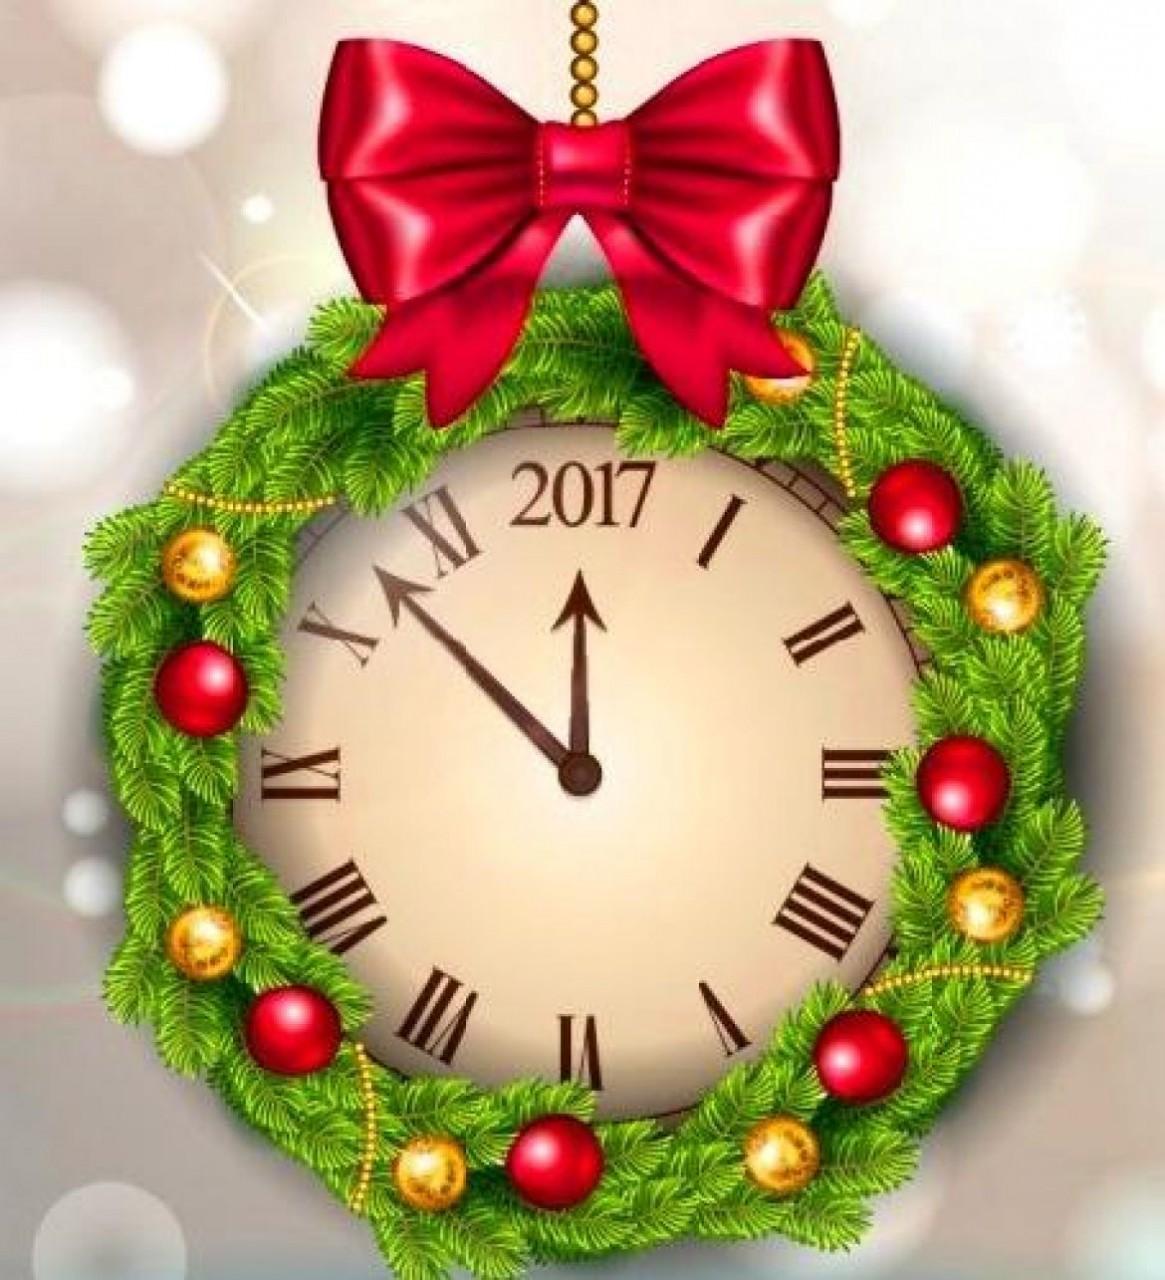 Часики картинка новогодняя